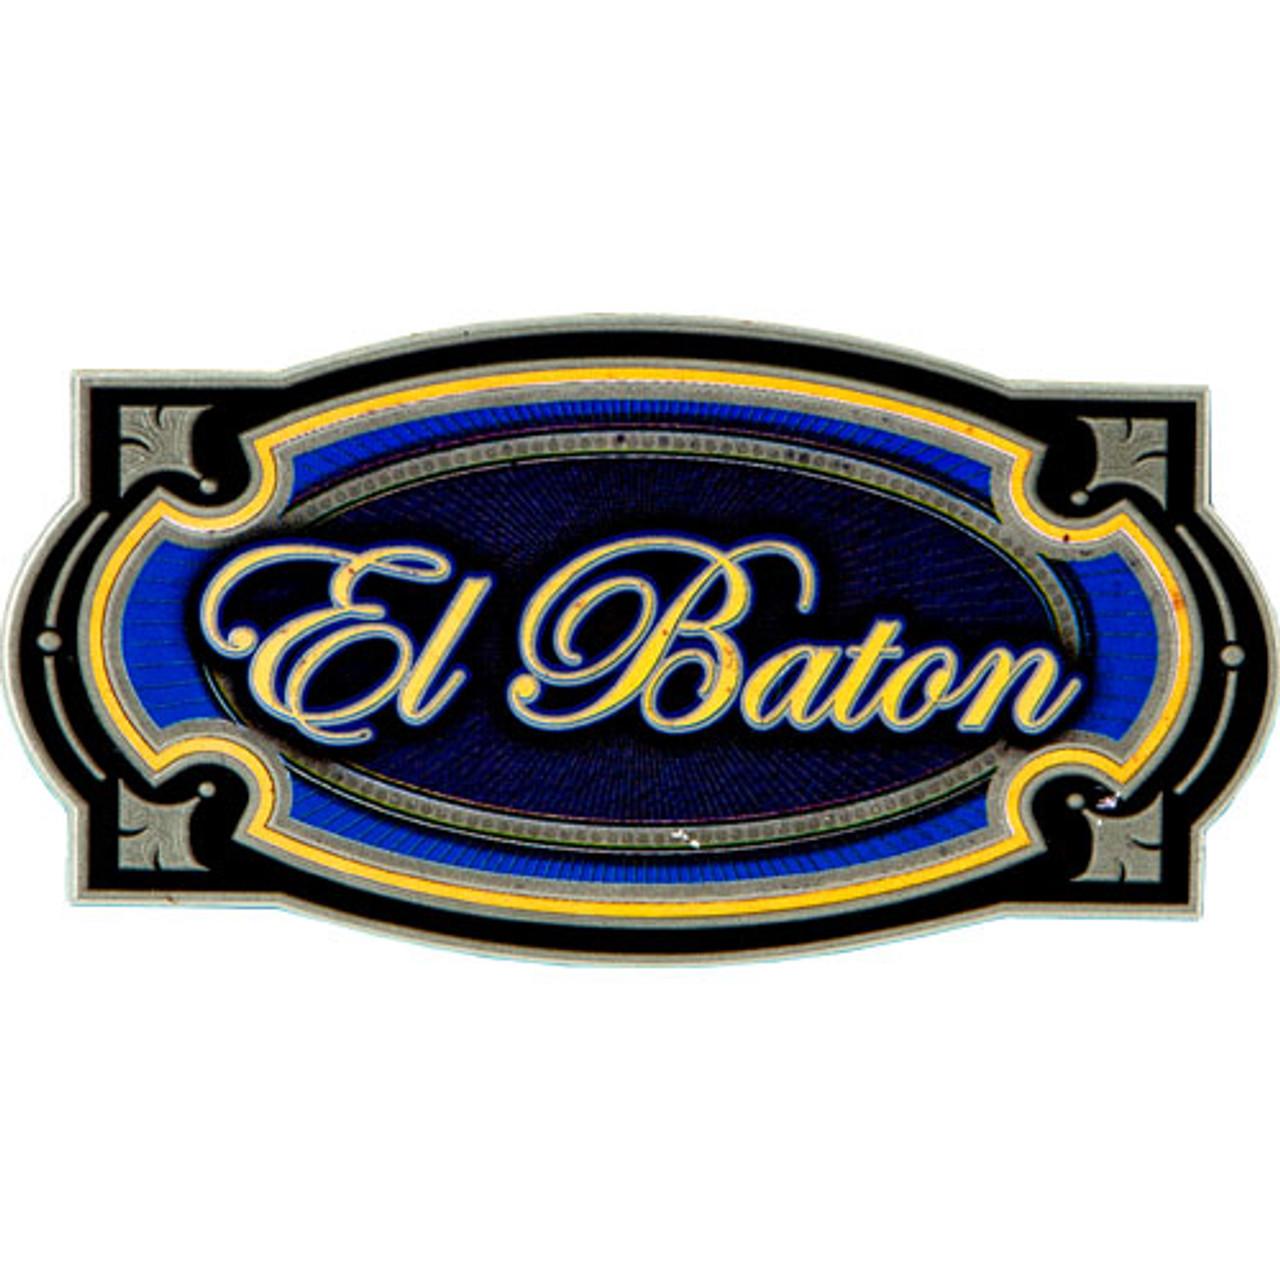 El Baton Double Toro Cigars - 6 x 60 (Box of 25)